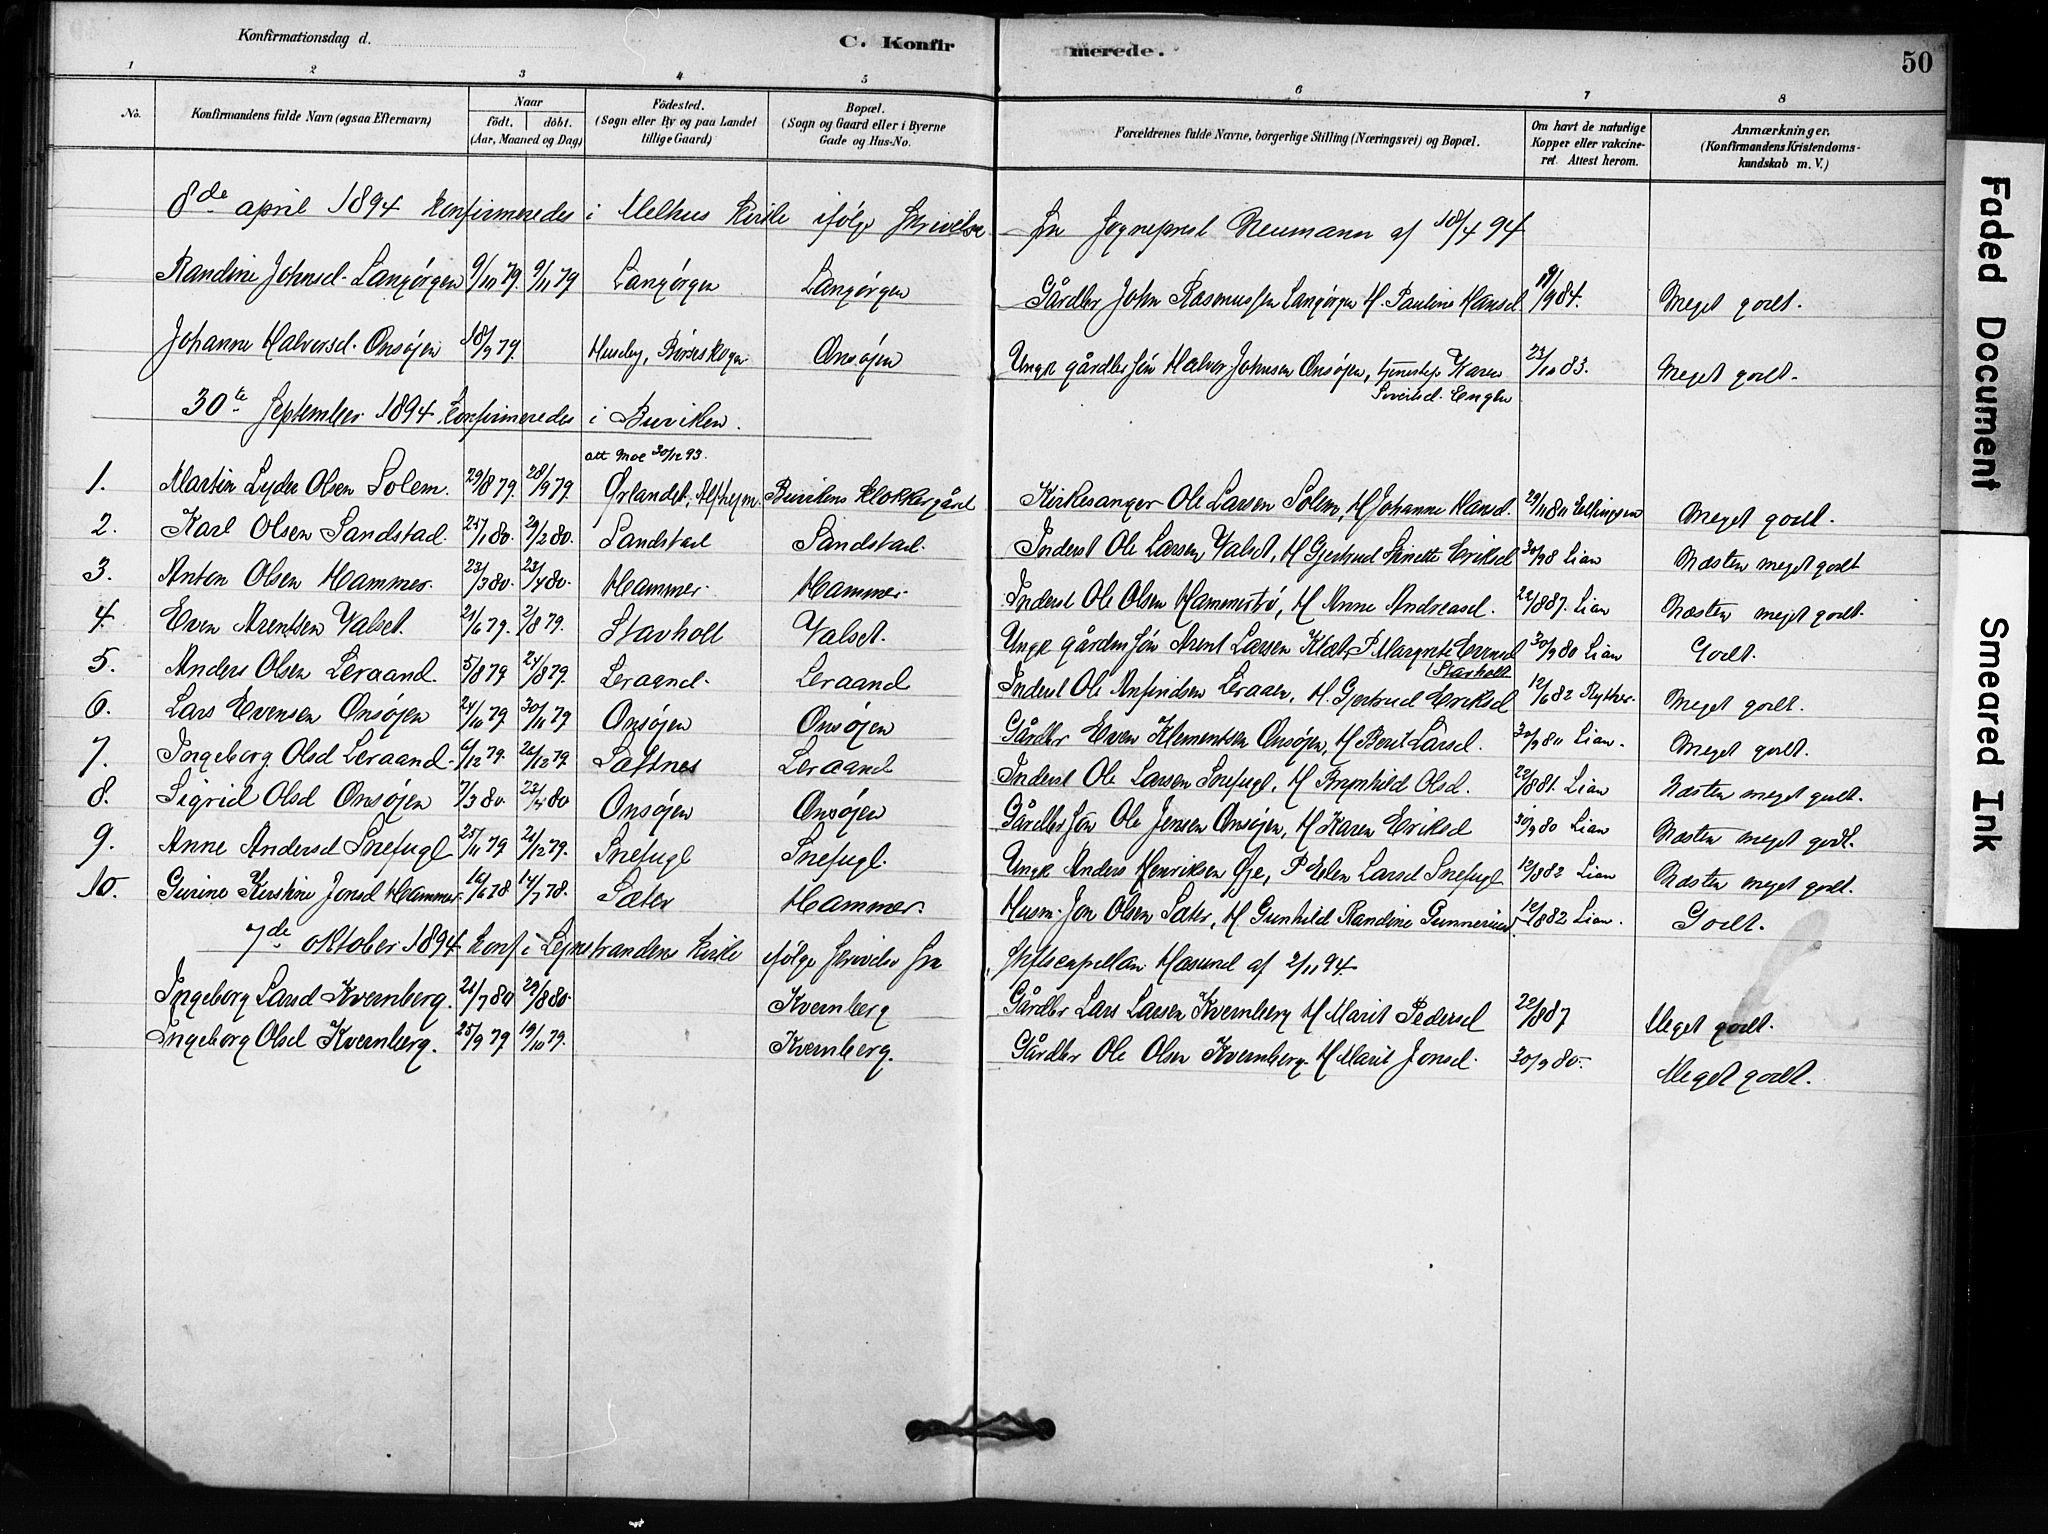 SAT, Ministerialprotokoller, klokkerbøker og fødselsregistre - Sør-Trøndelag, 666/L0786: Parish register (official) no. 666A04, 1878-1895, p. 50